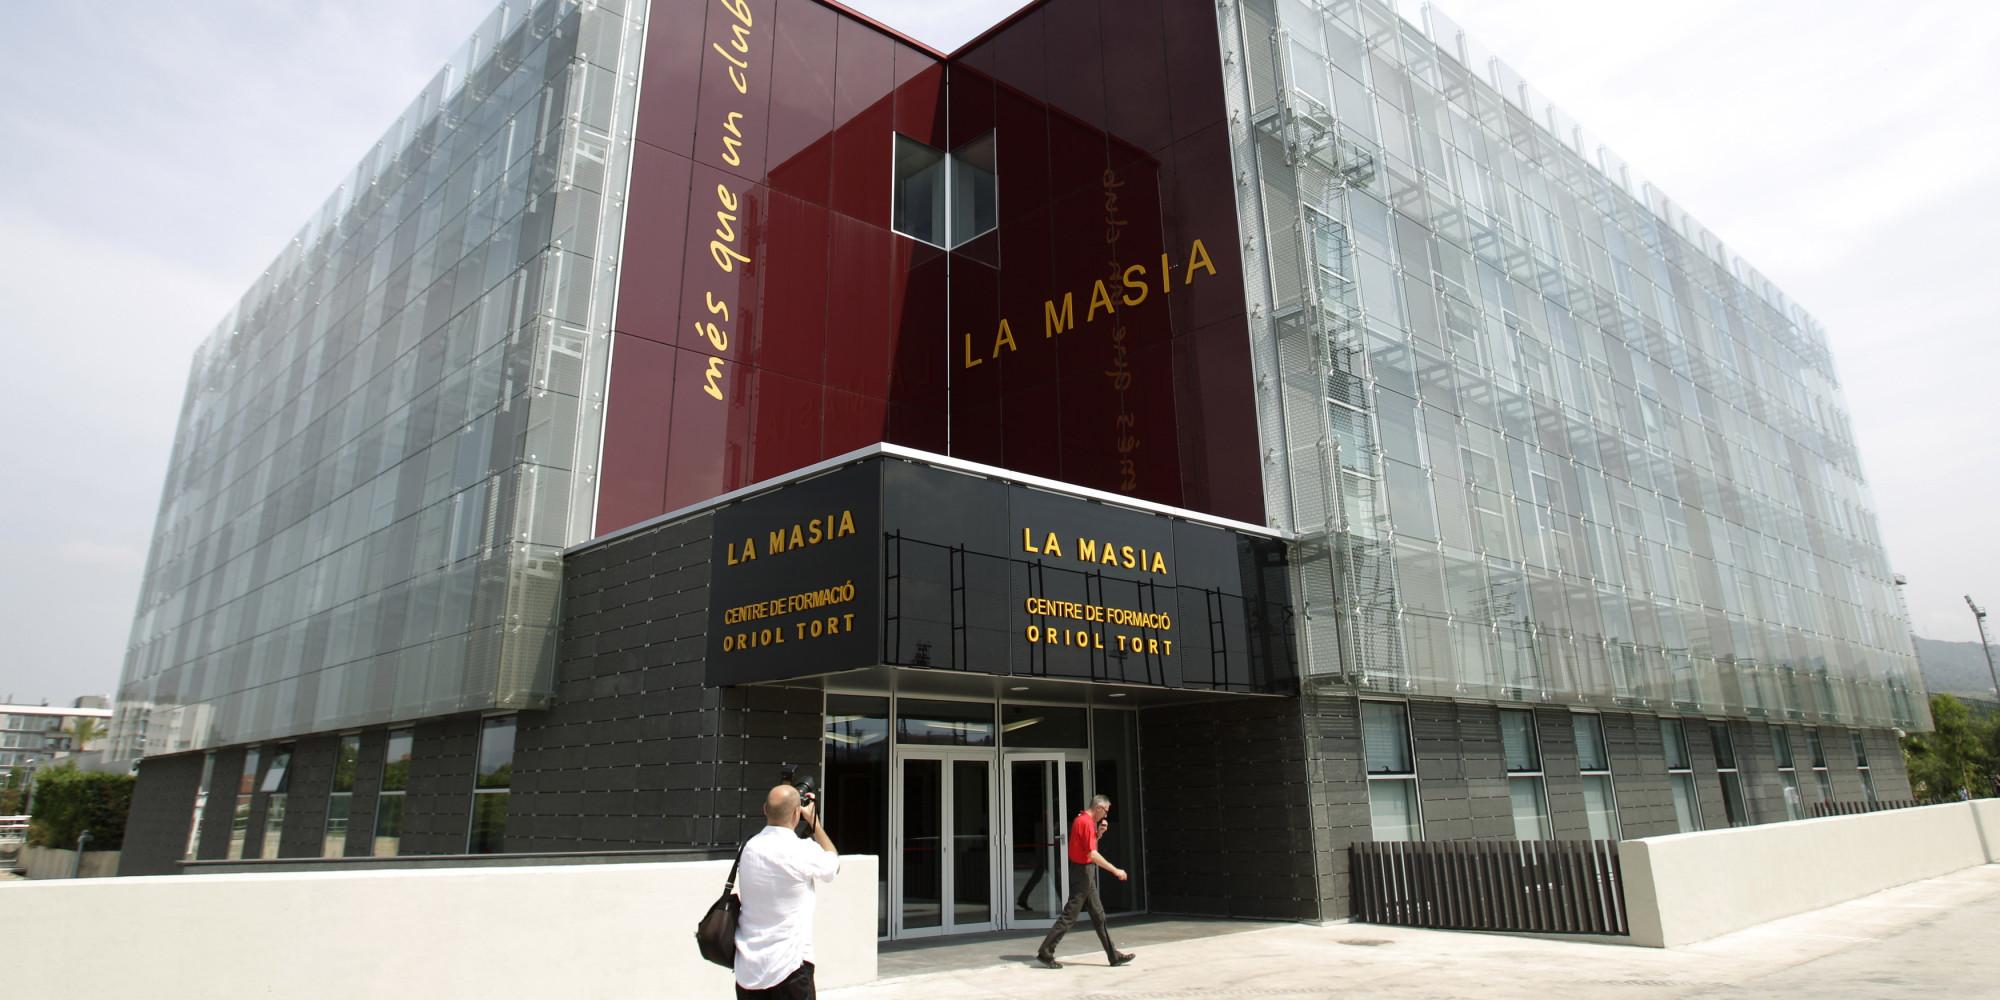 A view shows FC Barcelona's La Masia (Oriol Tort training center), near Barcelona